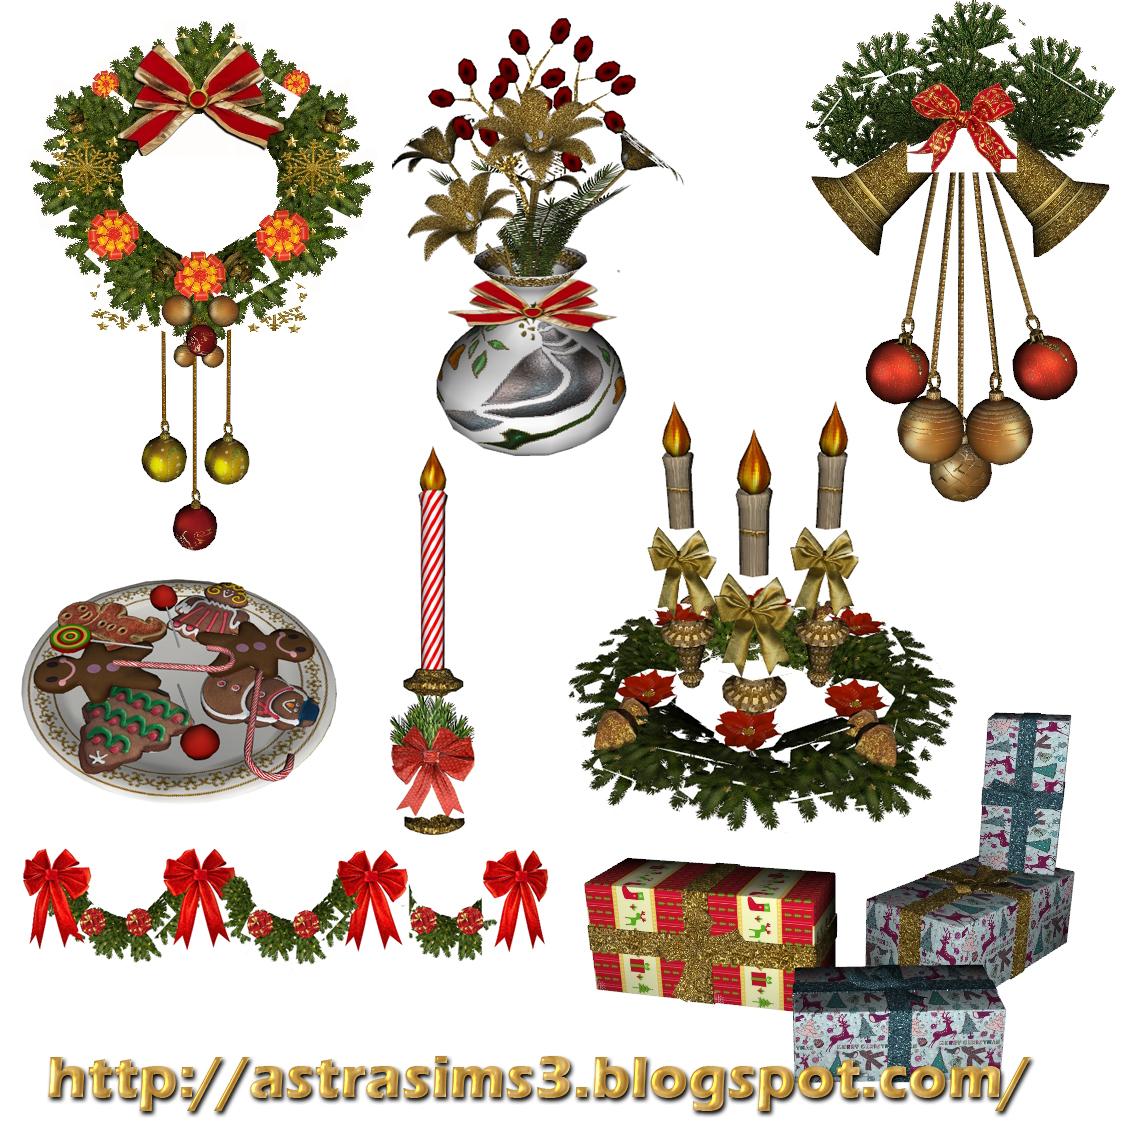 Christmas Decor Sims 3 : Astrasims newsea sims tr haven